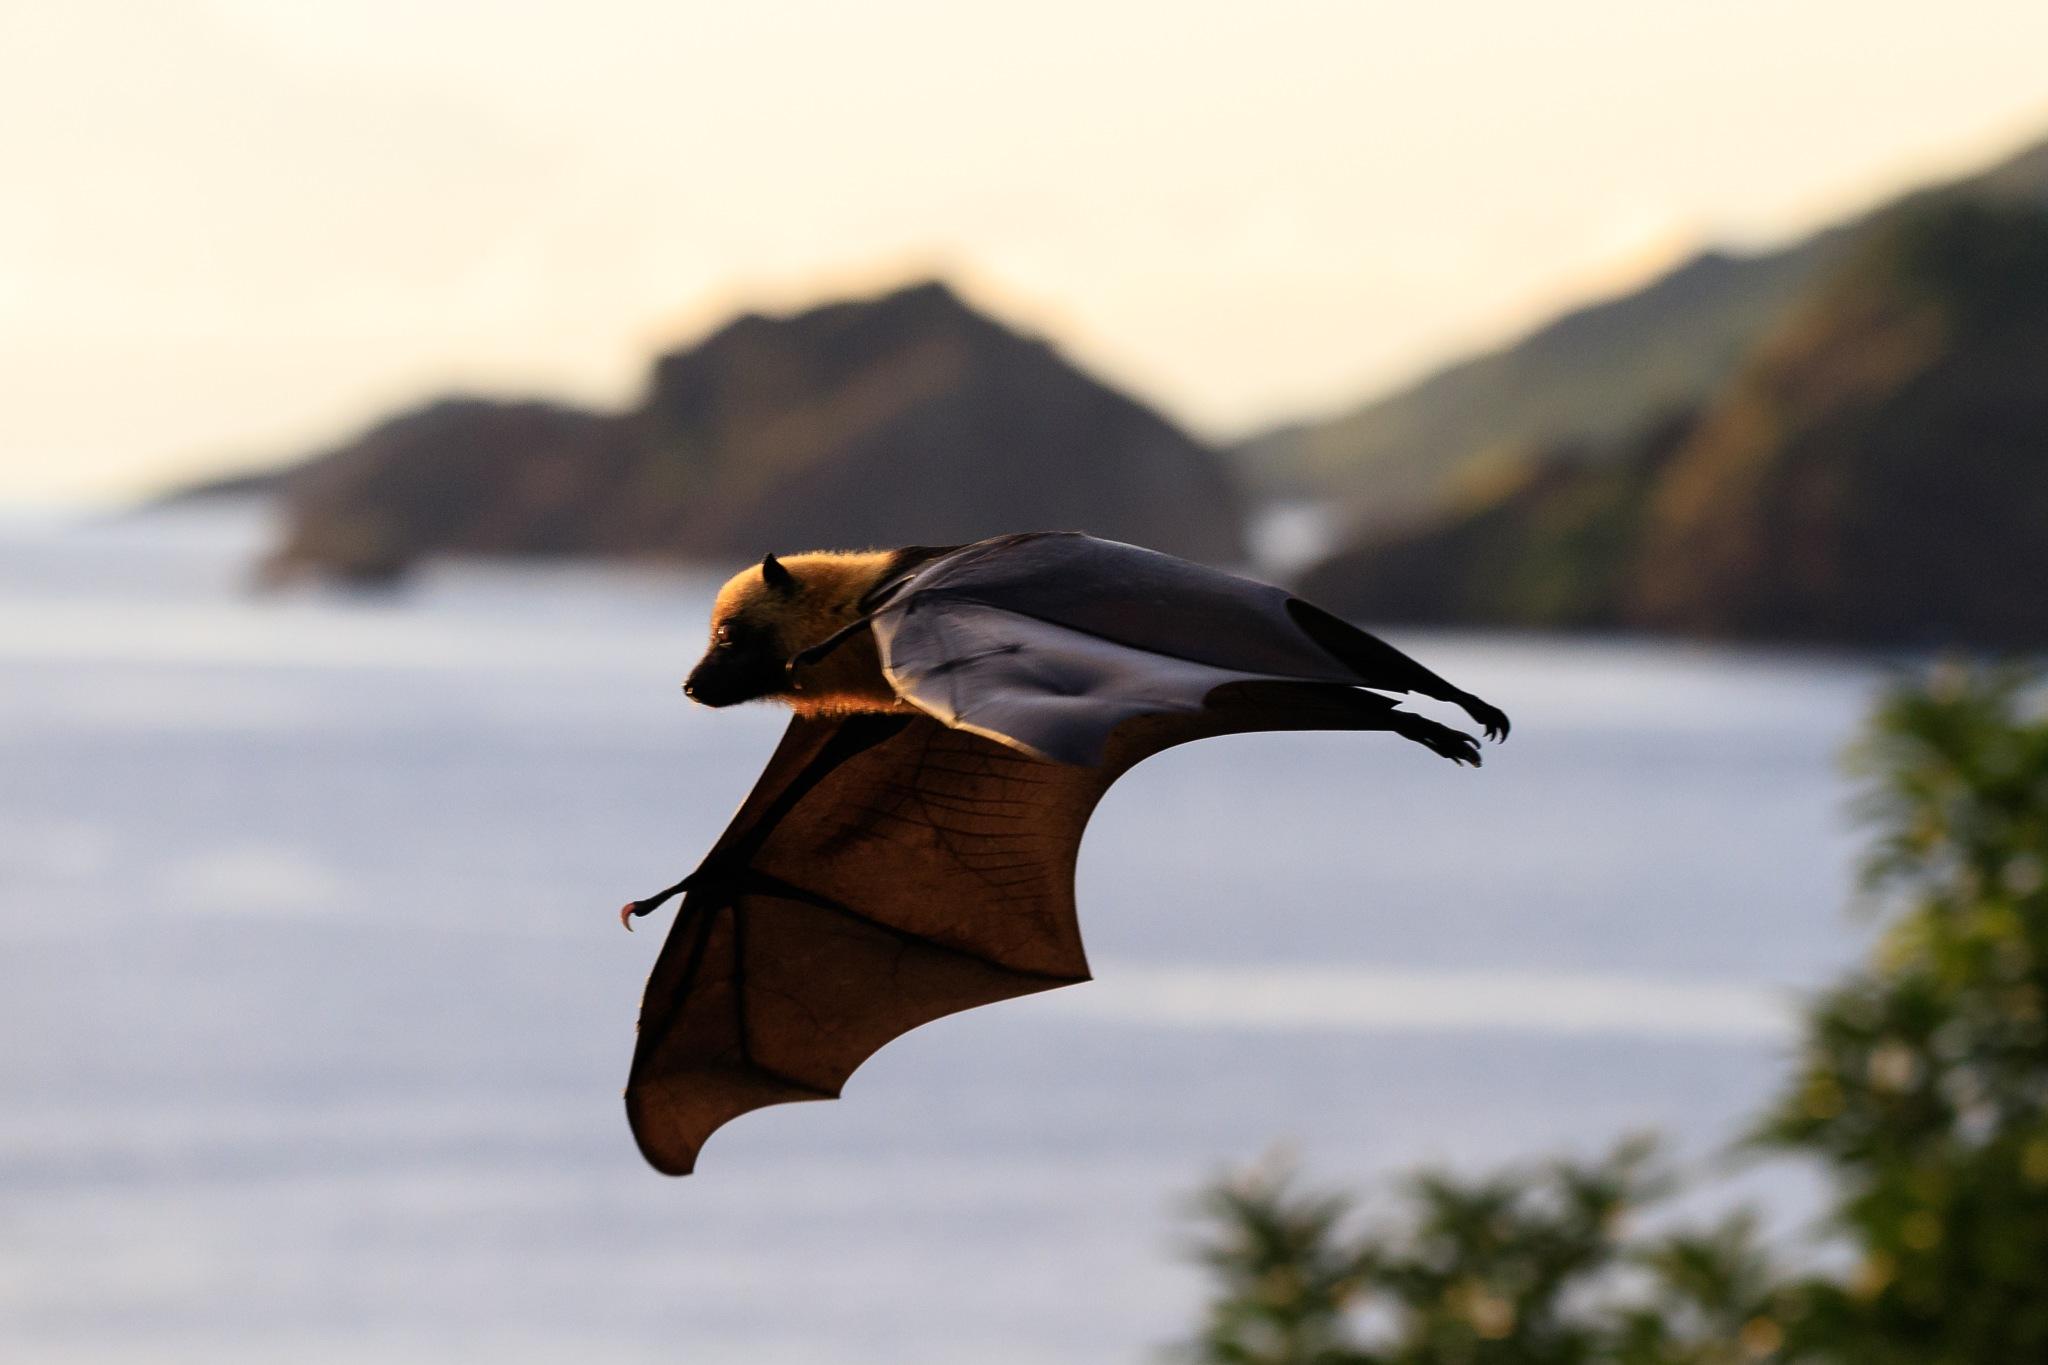 Roussette de Mayotte by Marco  Mayotte